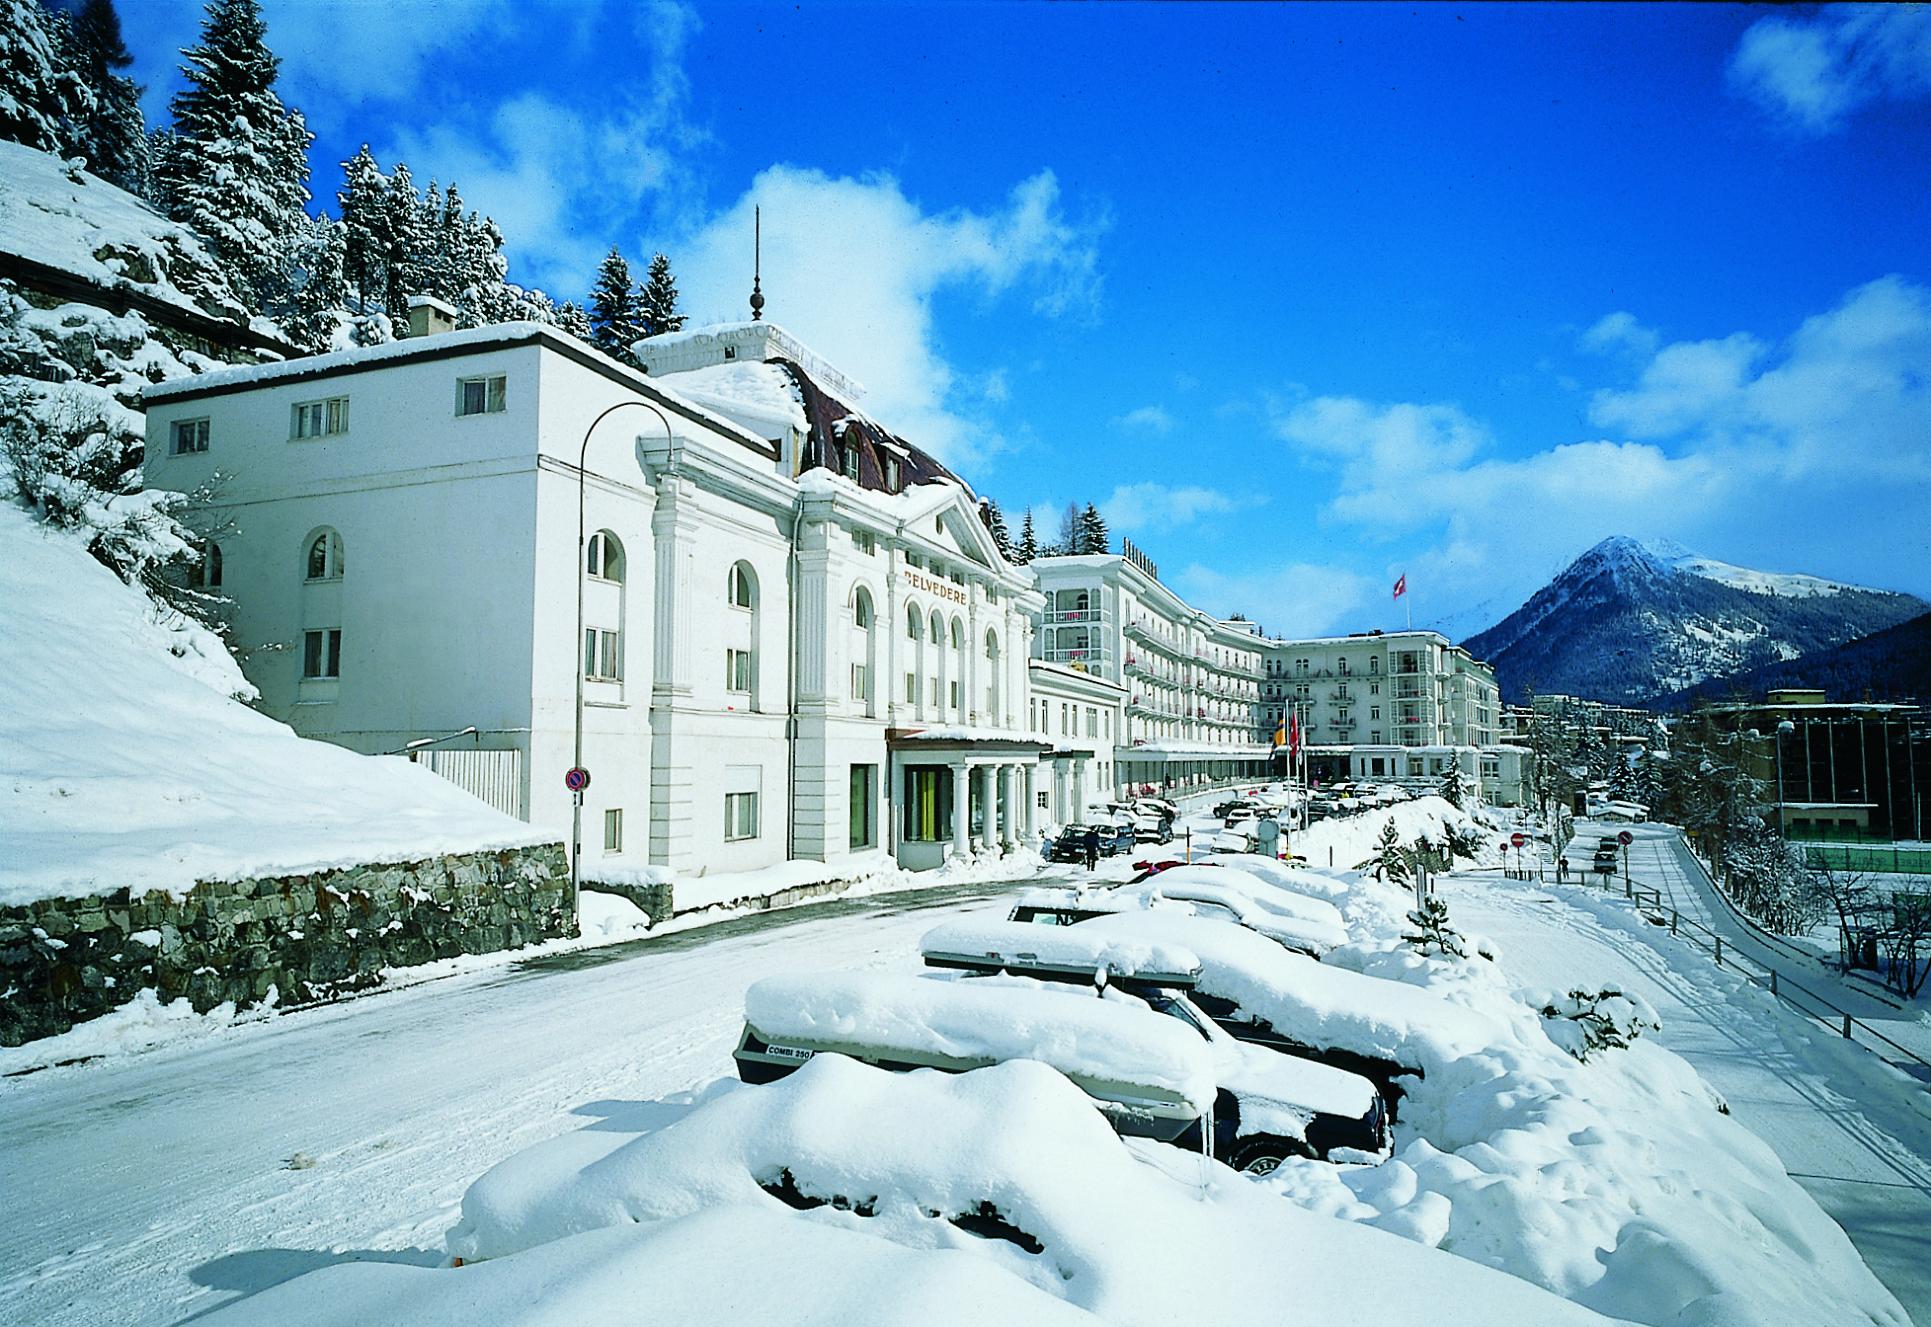 44493_SHR_BelvedereDavos_exterior_exterior33_snow_2.jpg